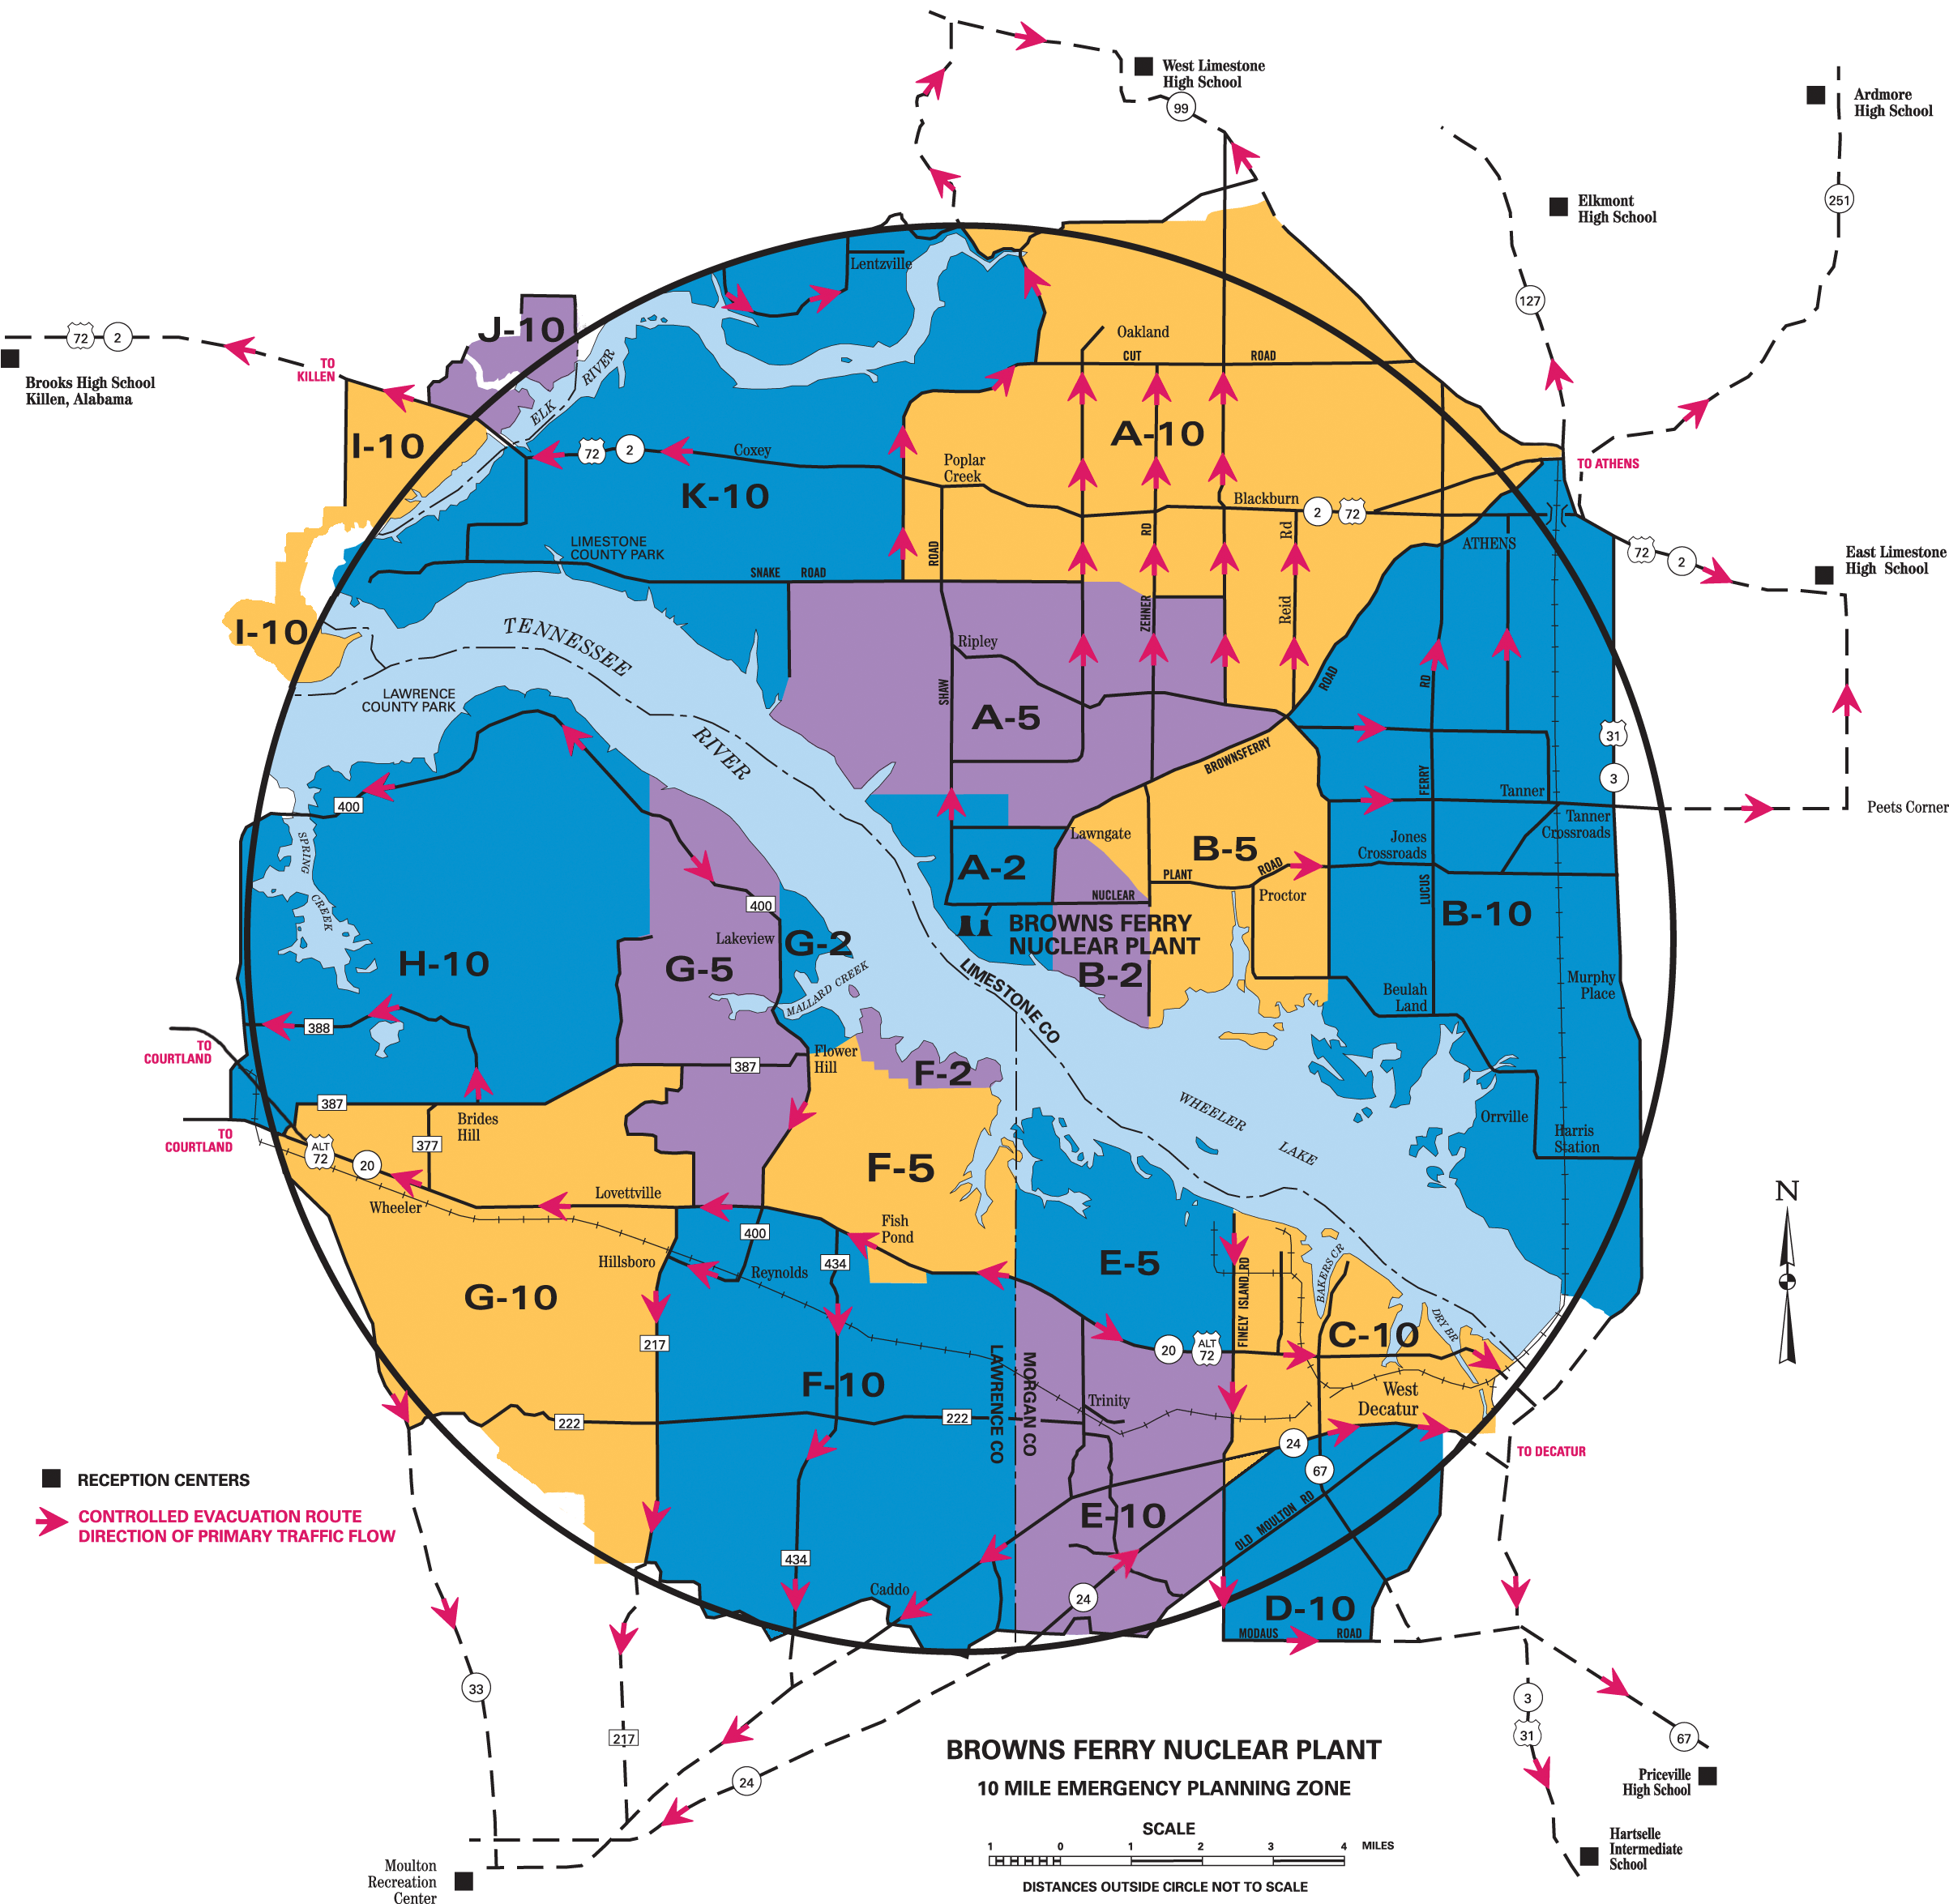 BFN_Evac_Map_7.29.14.png